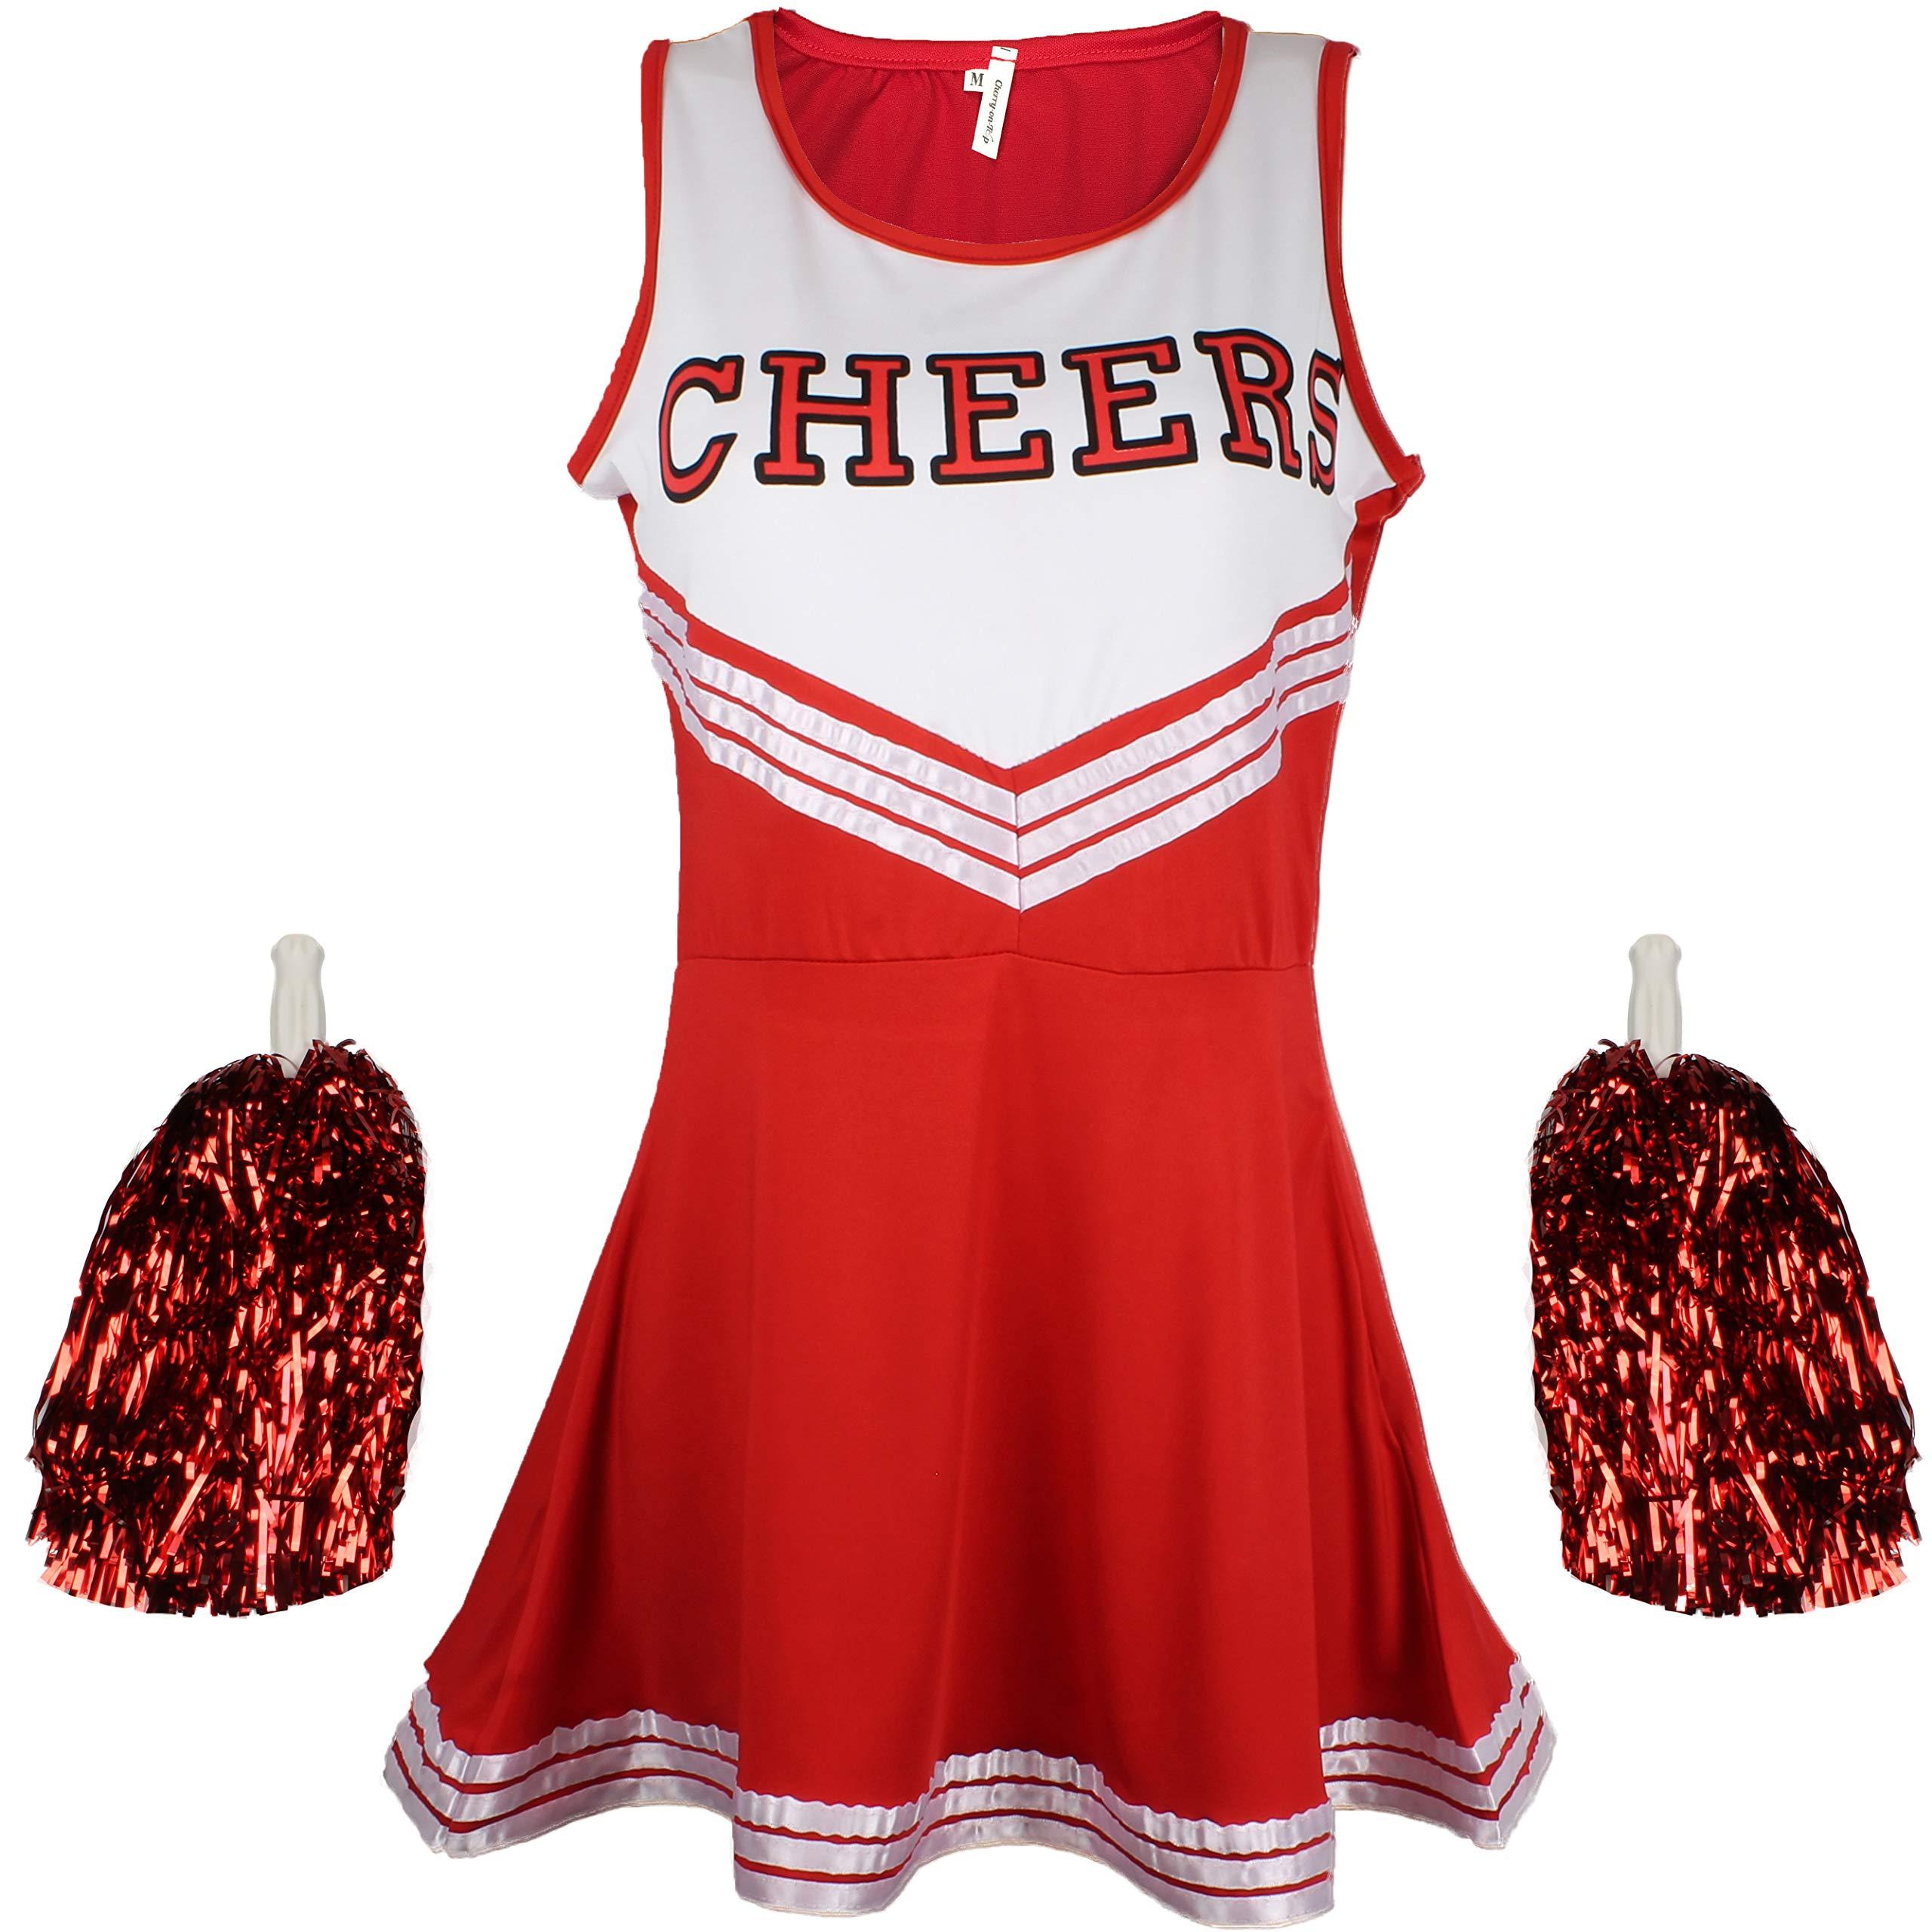 Cheerleader Fancy Dress Outfit Uniform High School Musical Costume with Pom Poms Red Cheerleader, Medium